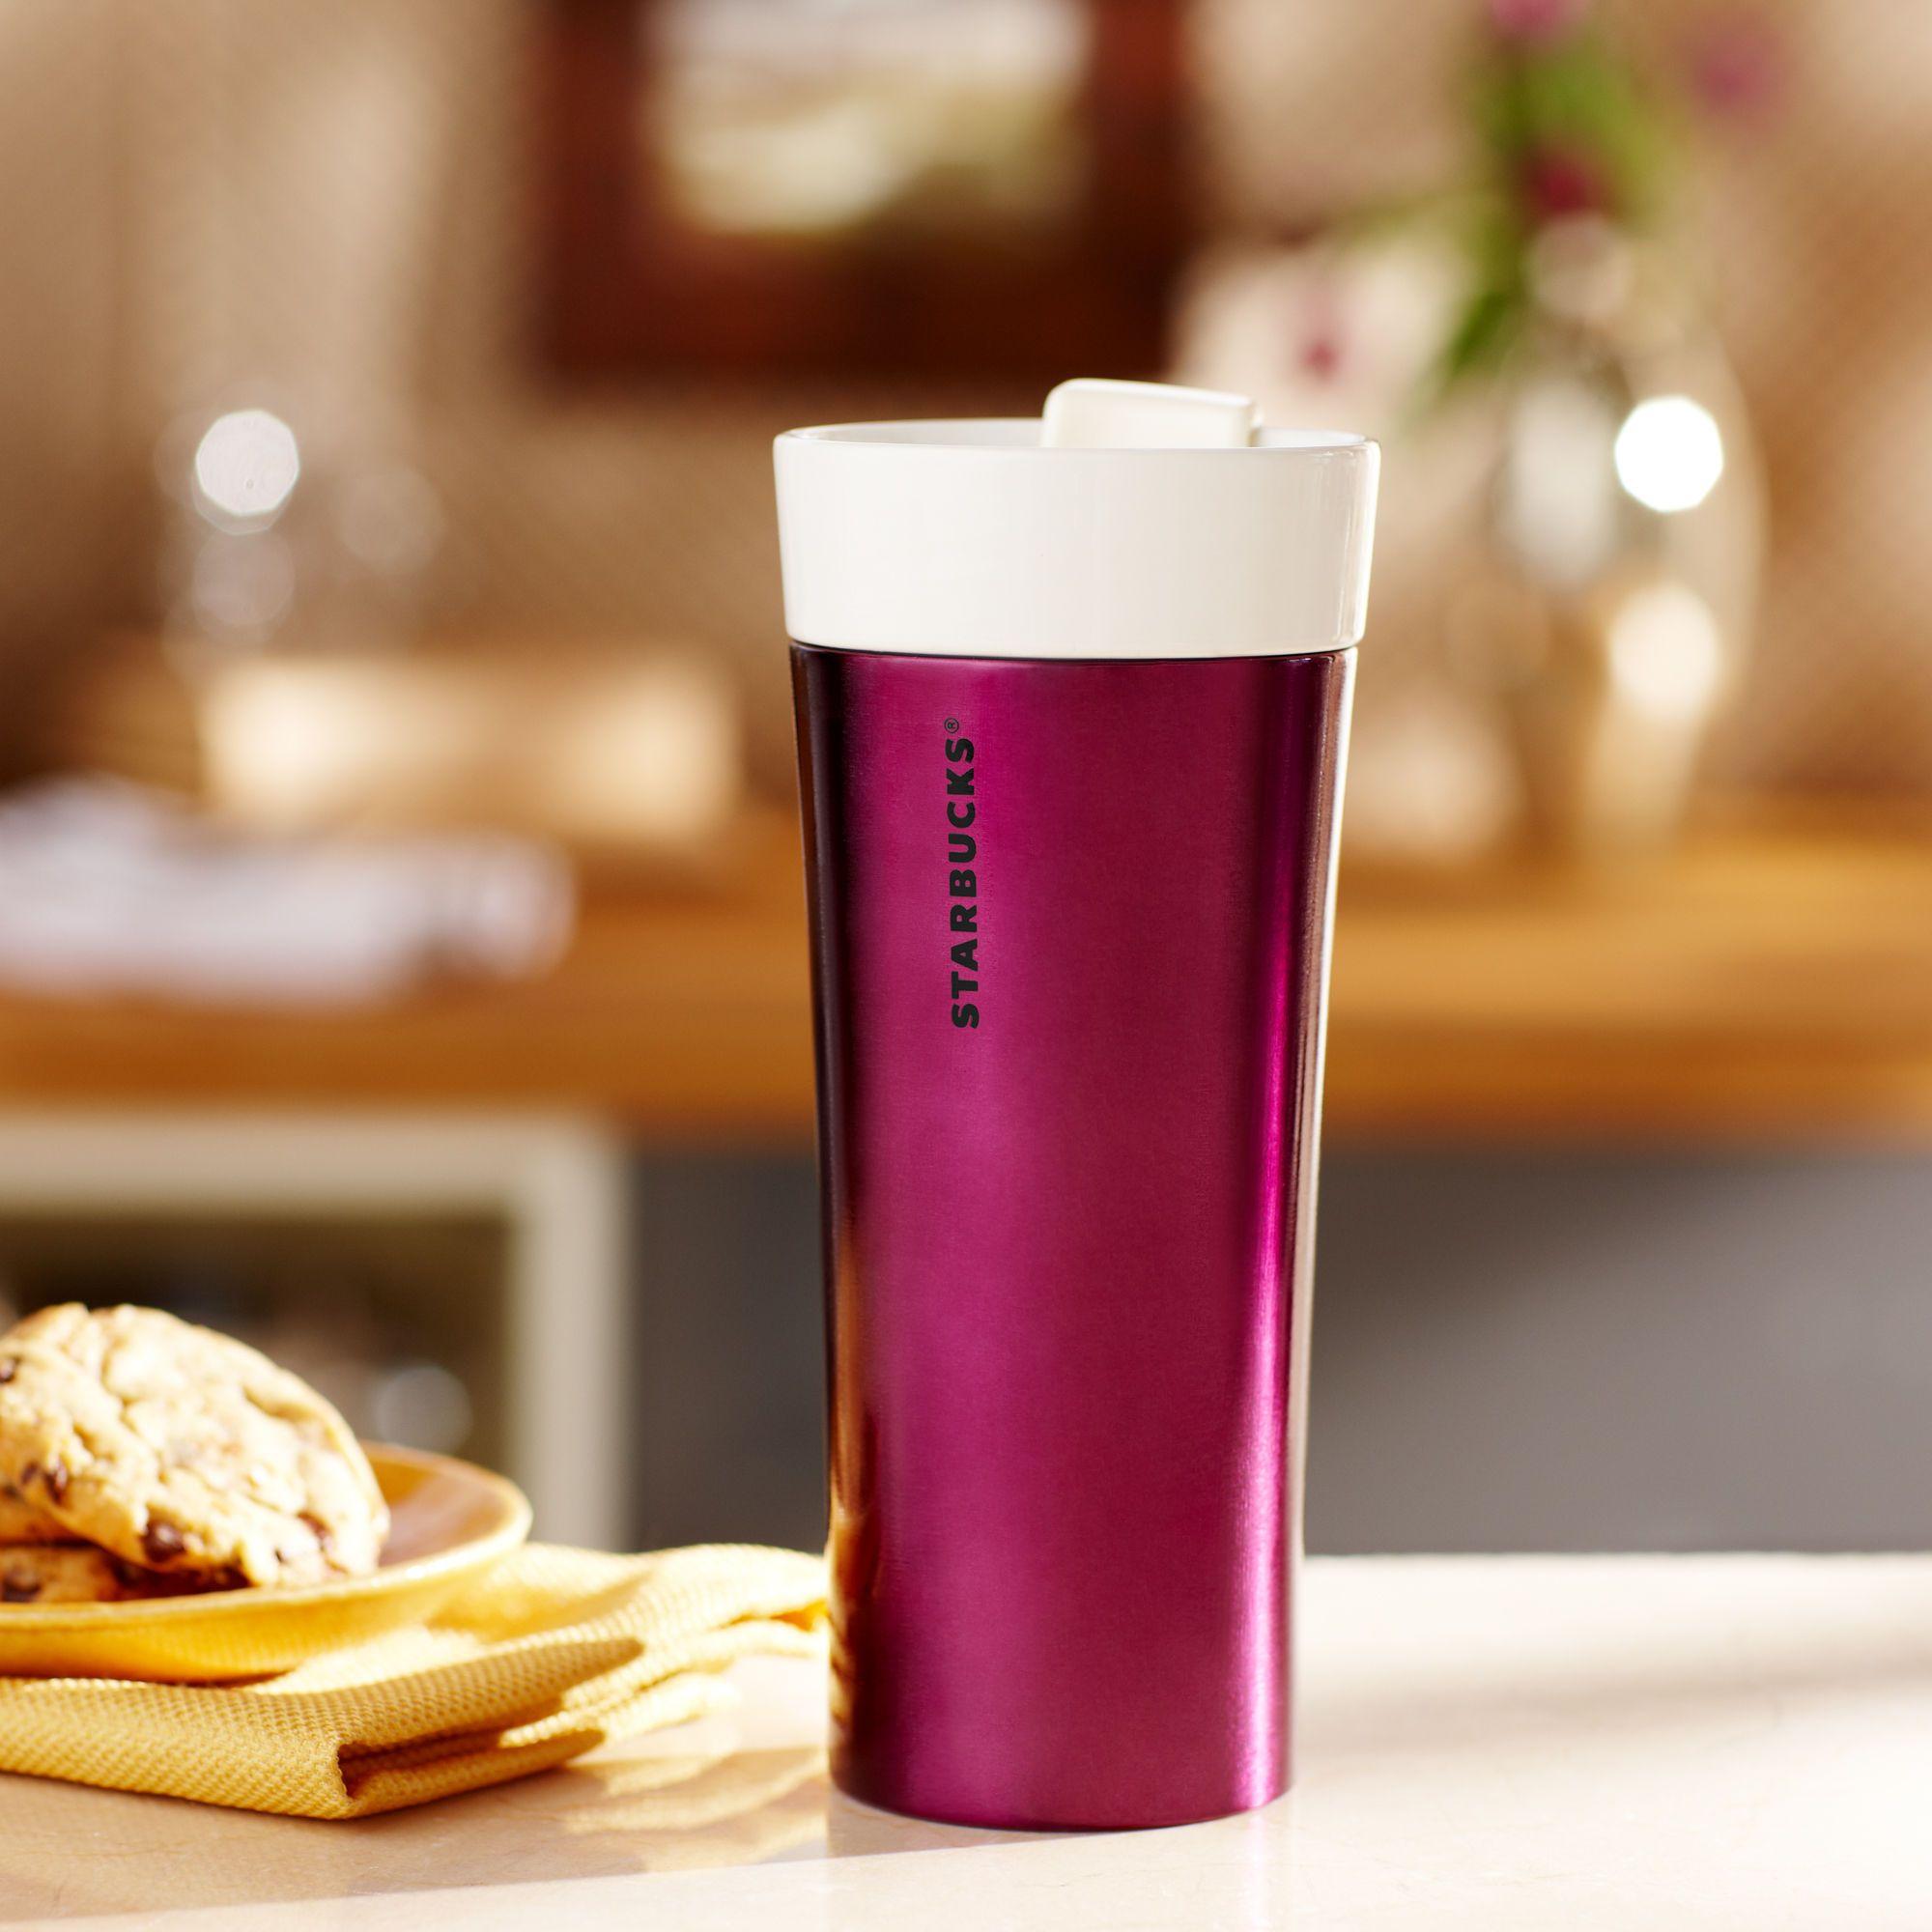 Coffee Starbucks Purple Ceramic Tumbler Mugs Starbucks Tumbler